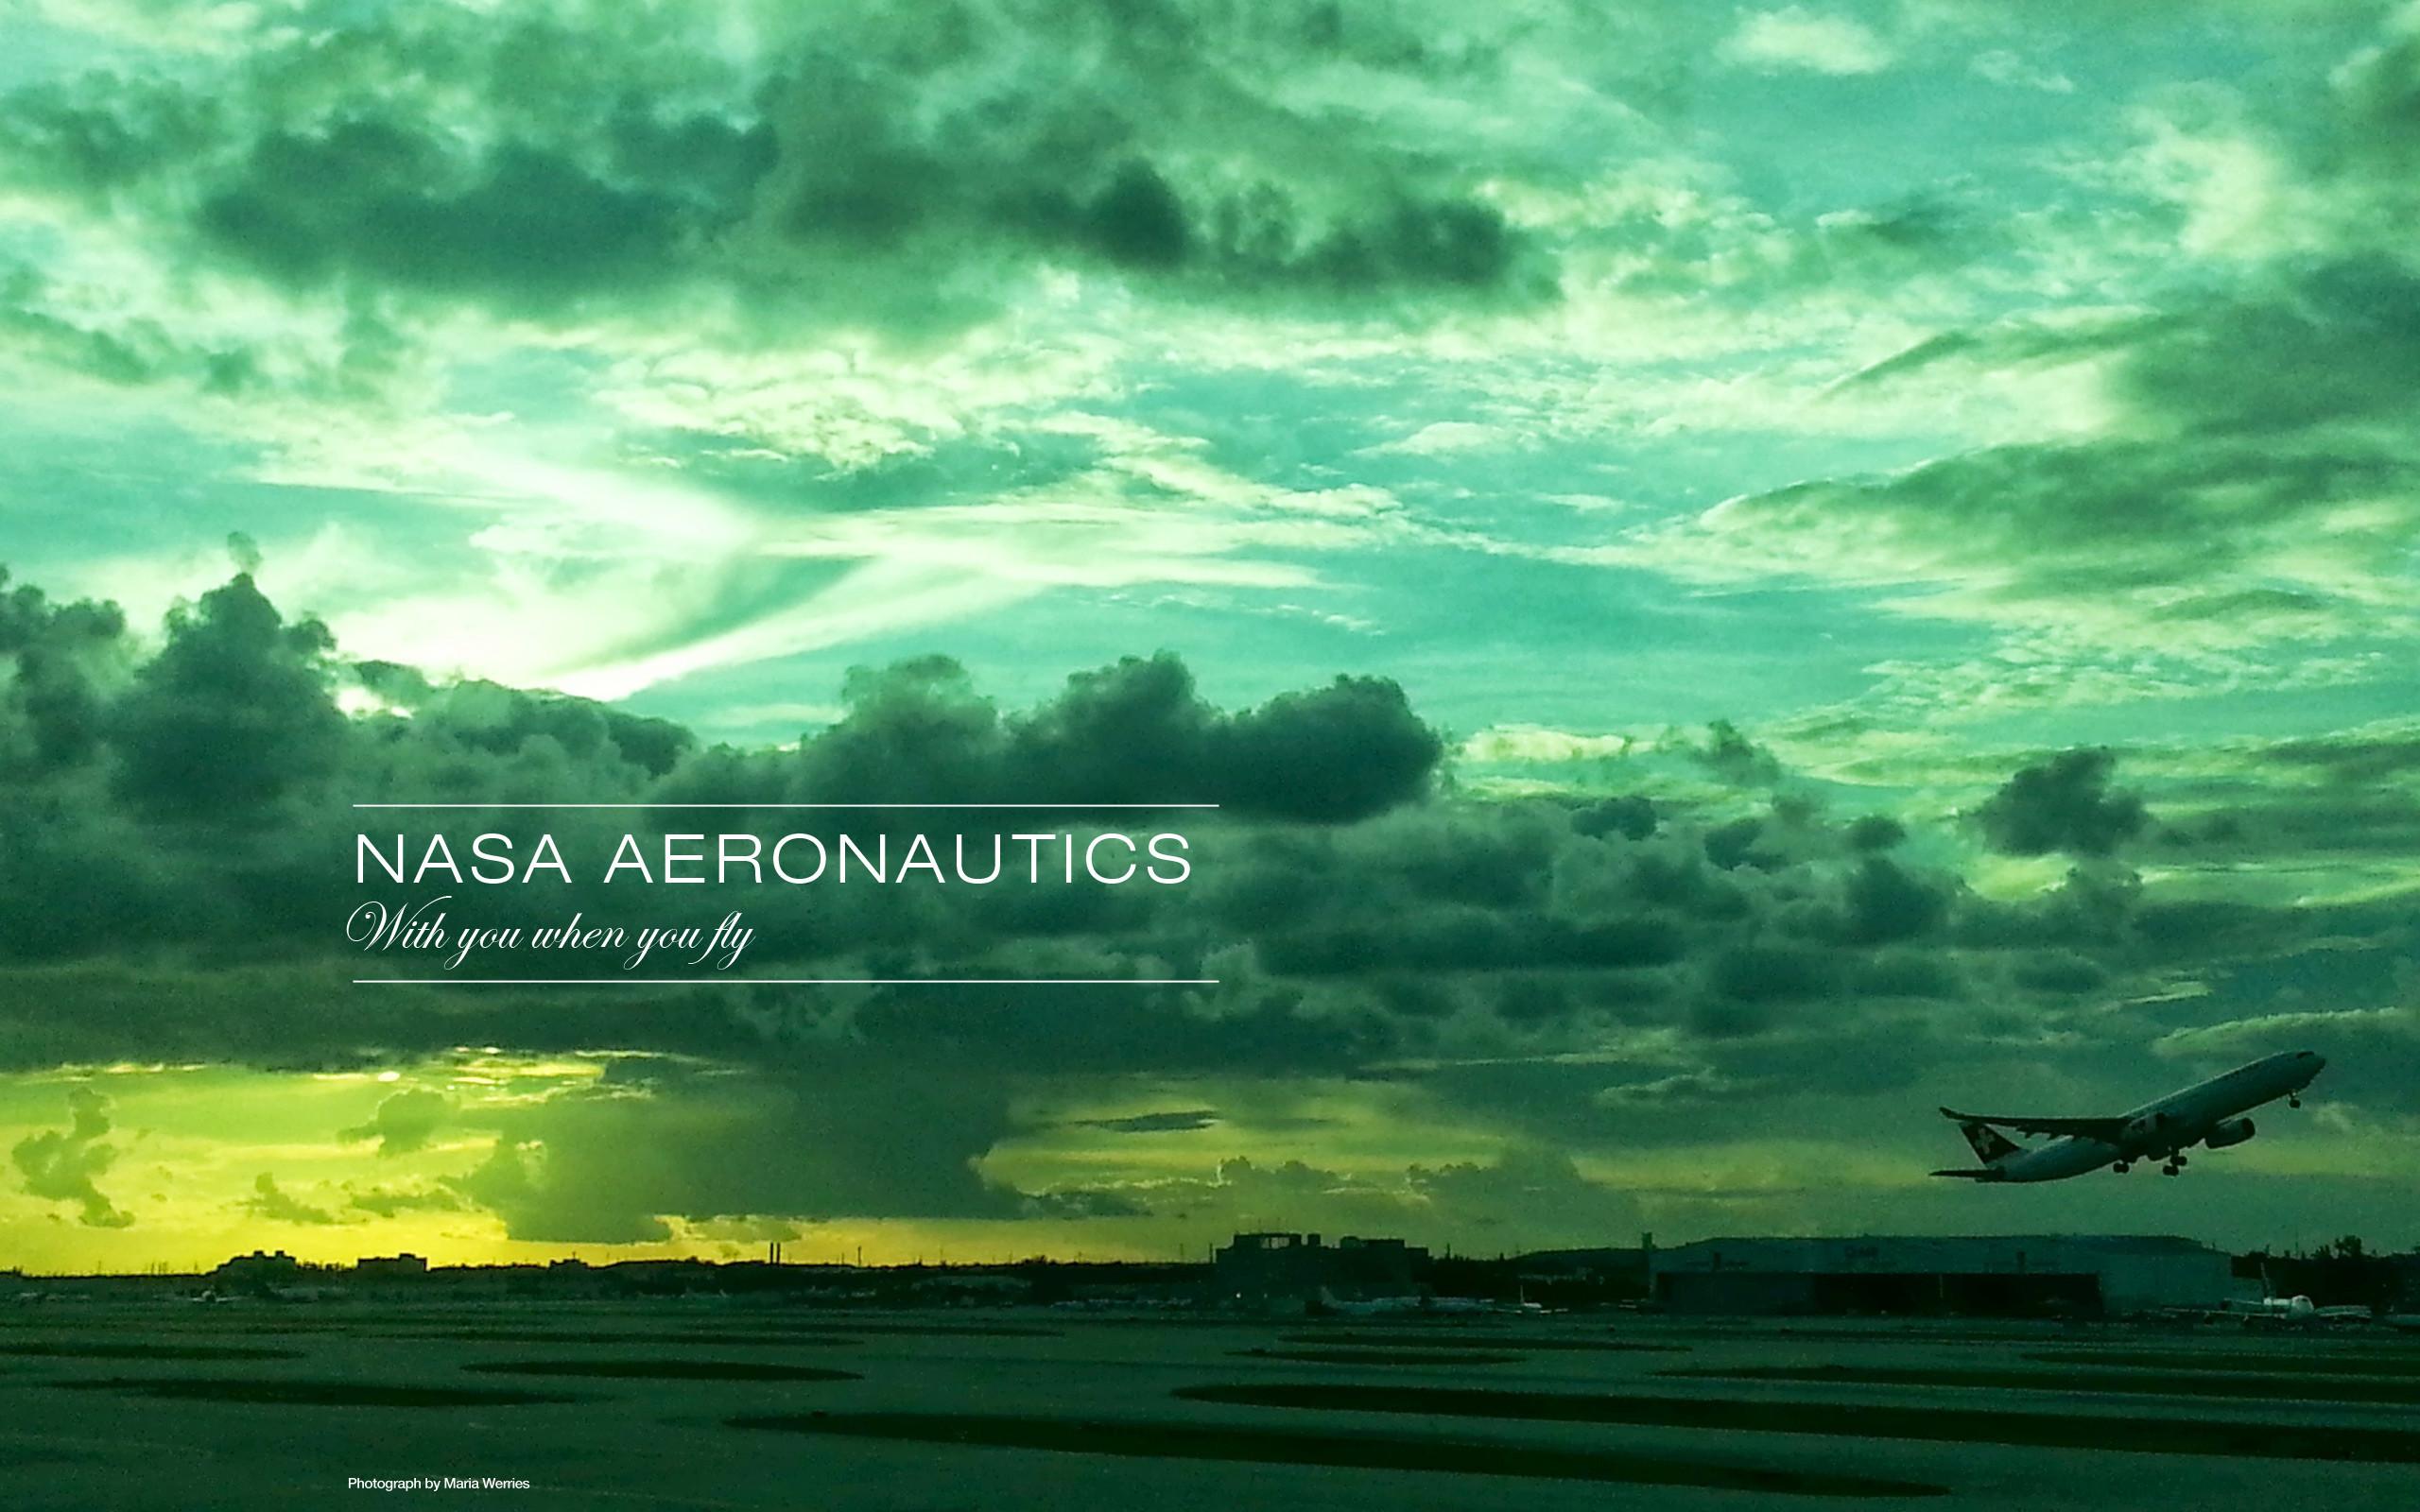 NASA Aeronautics Wallpaper Design 1